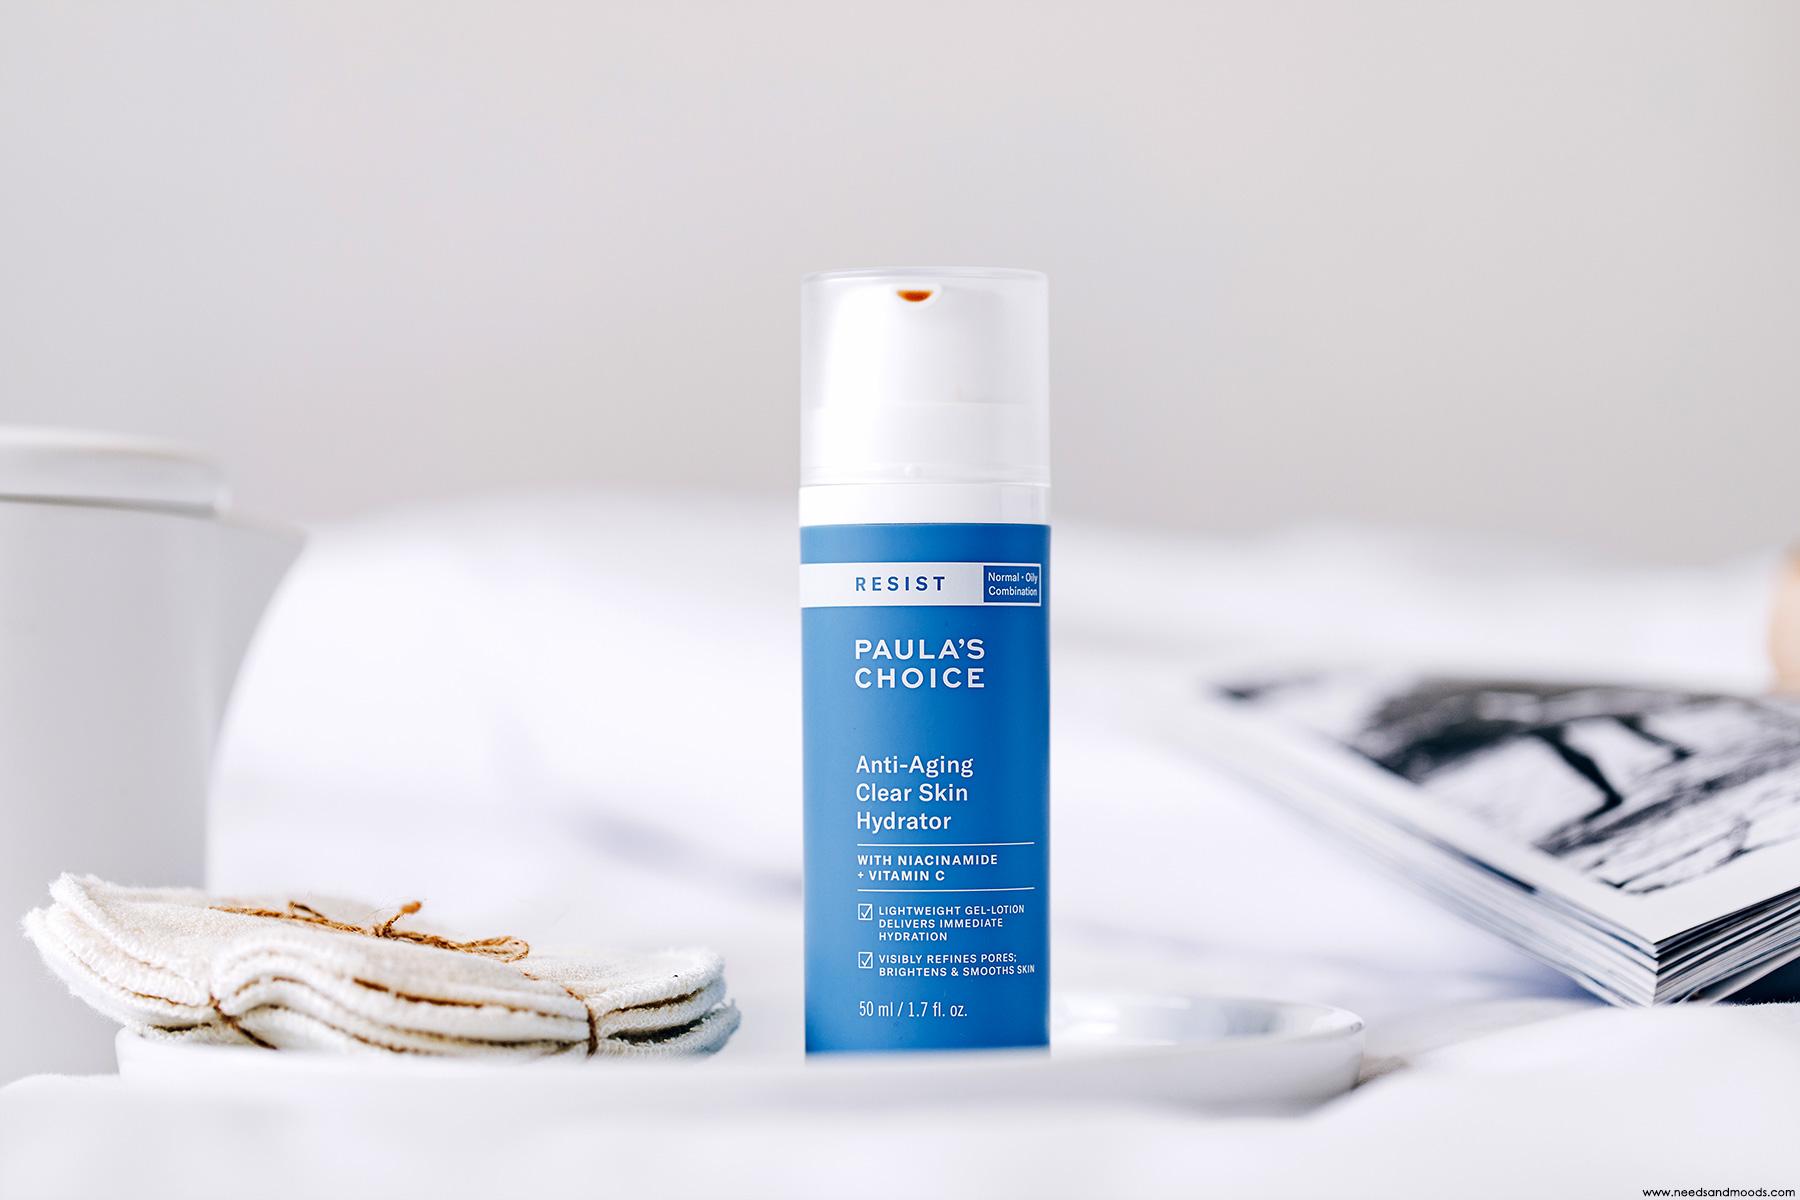 paula's choice avis anti aging clear skin hydrator